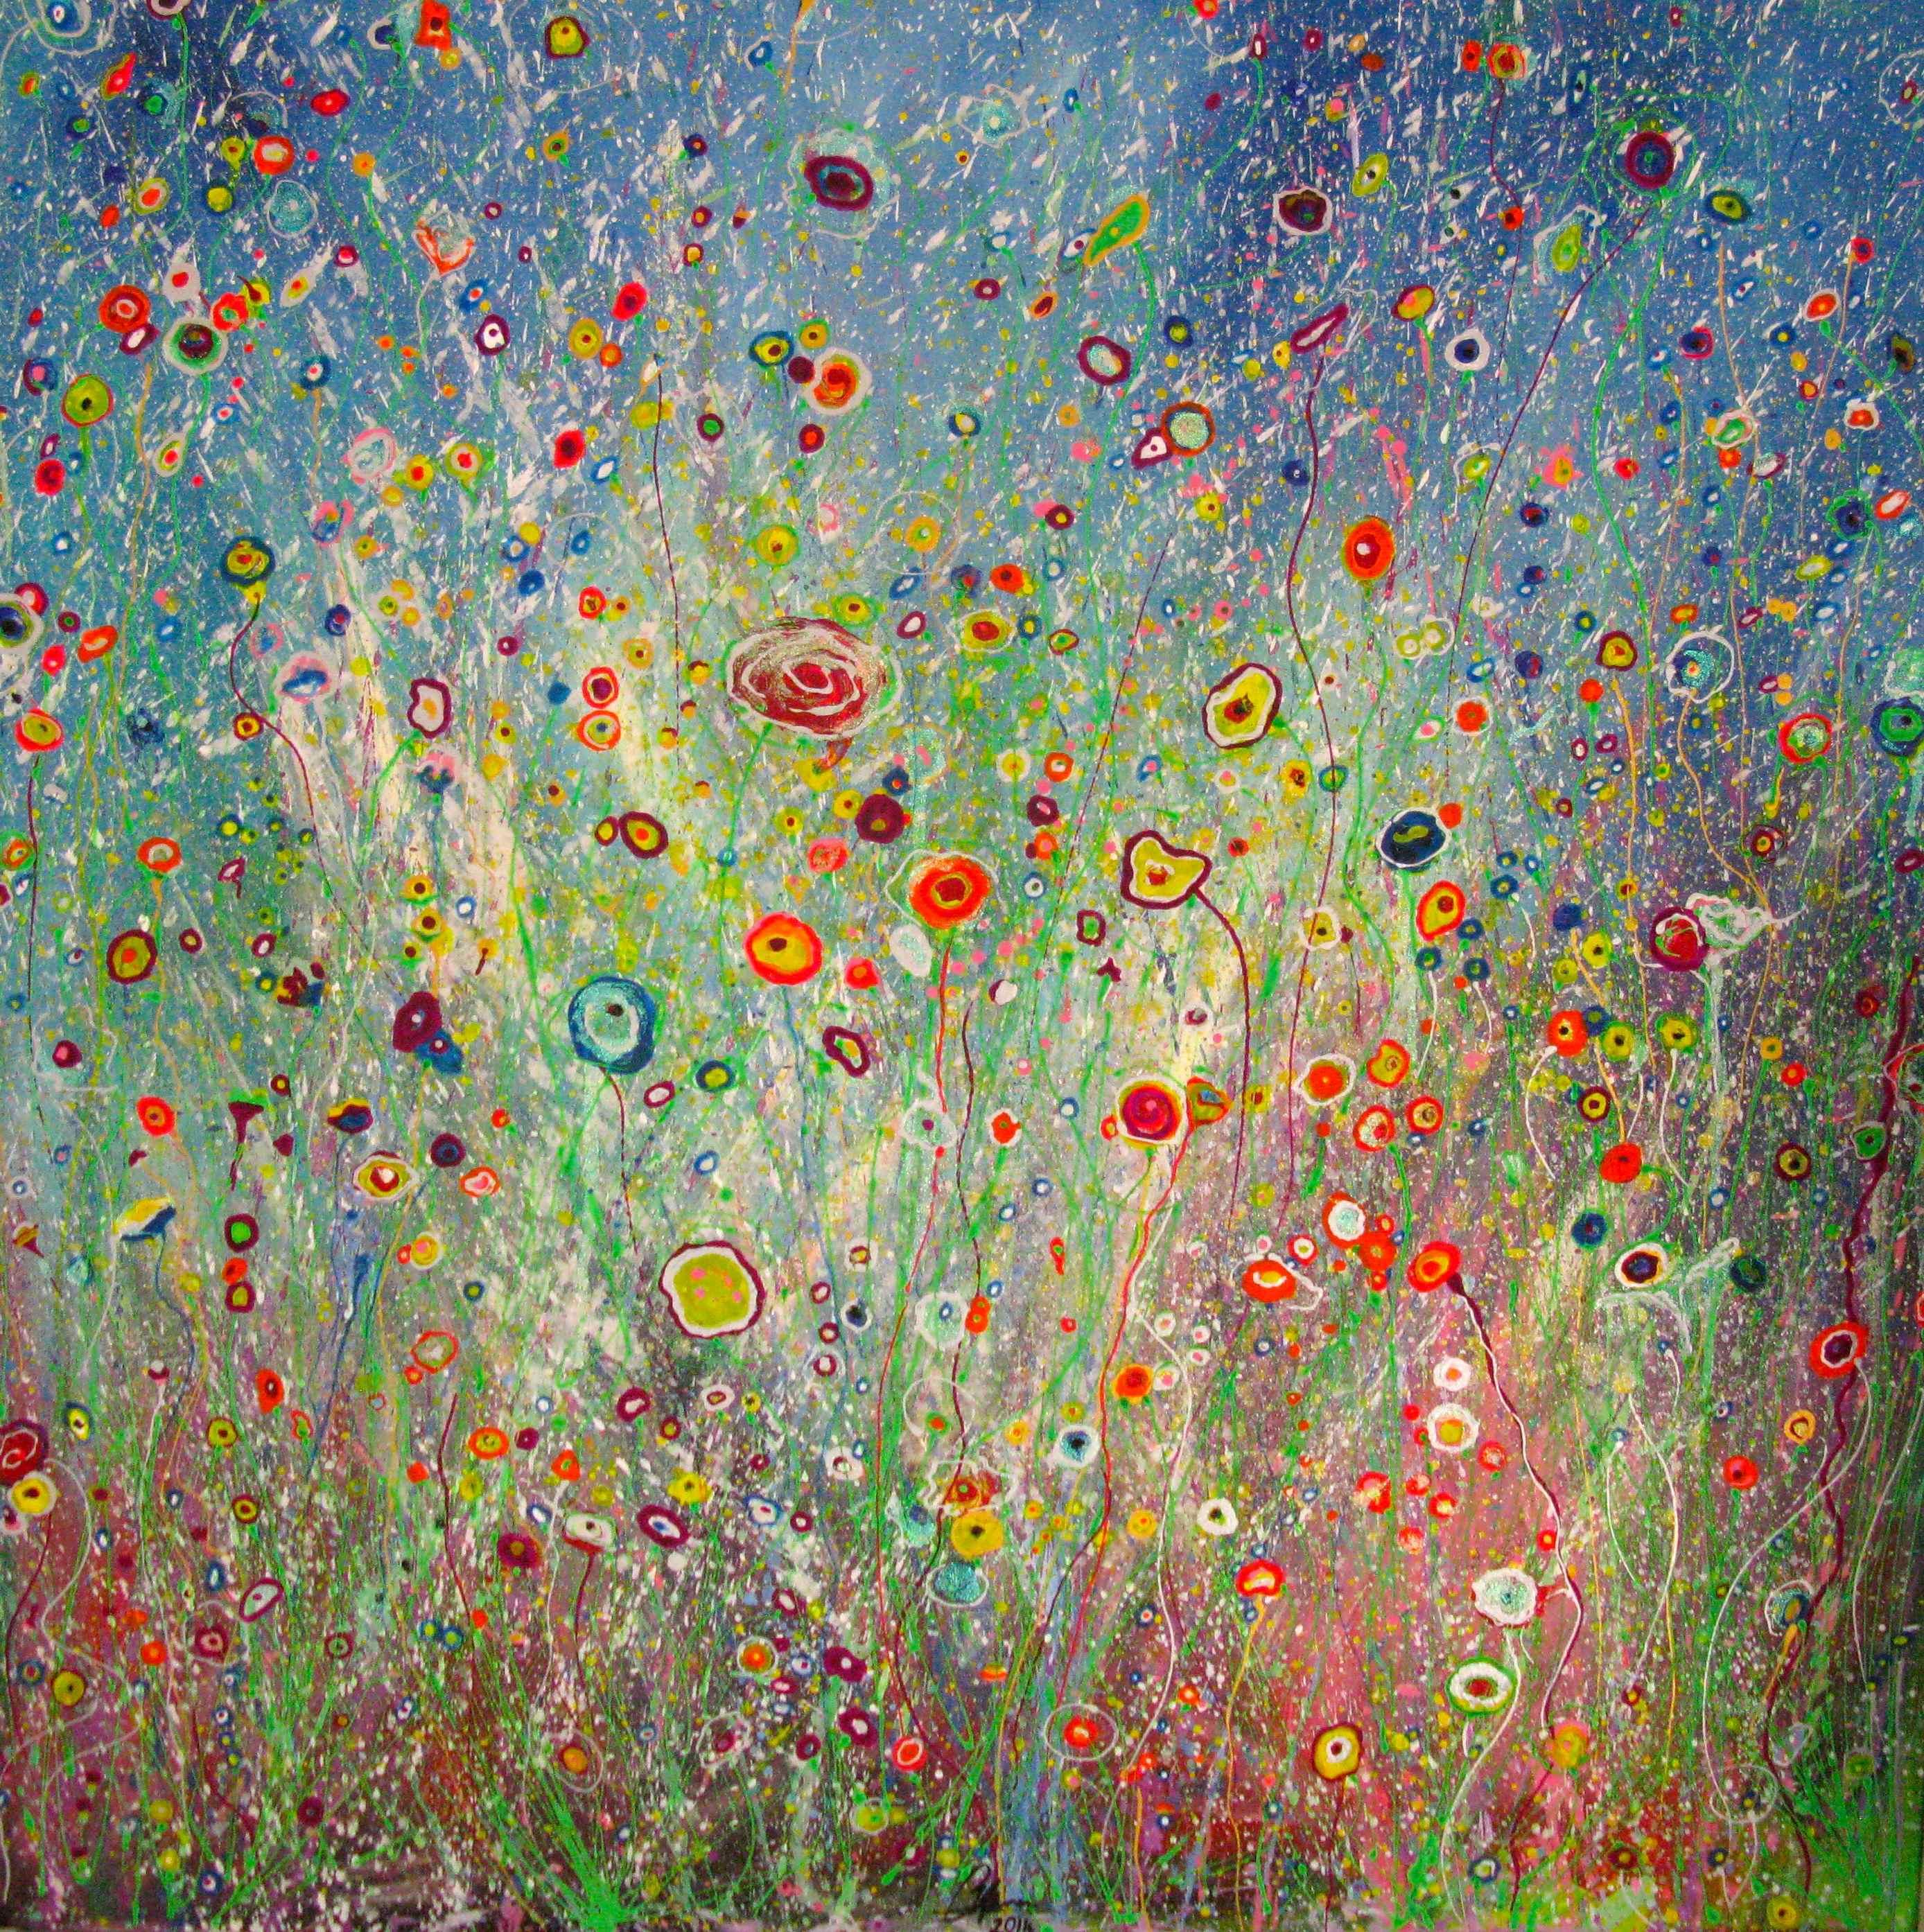 Wild Summer 1 artwork by Cheney Fairchild - art listed for sale on Artplode